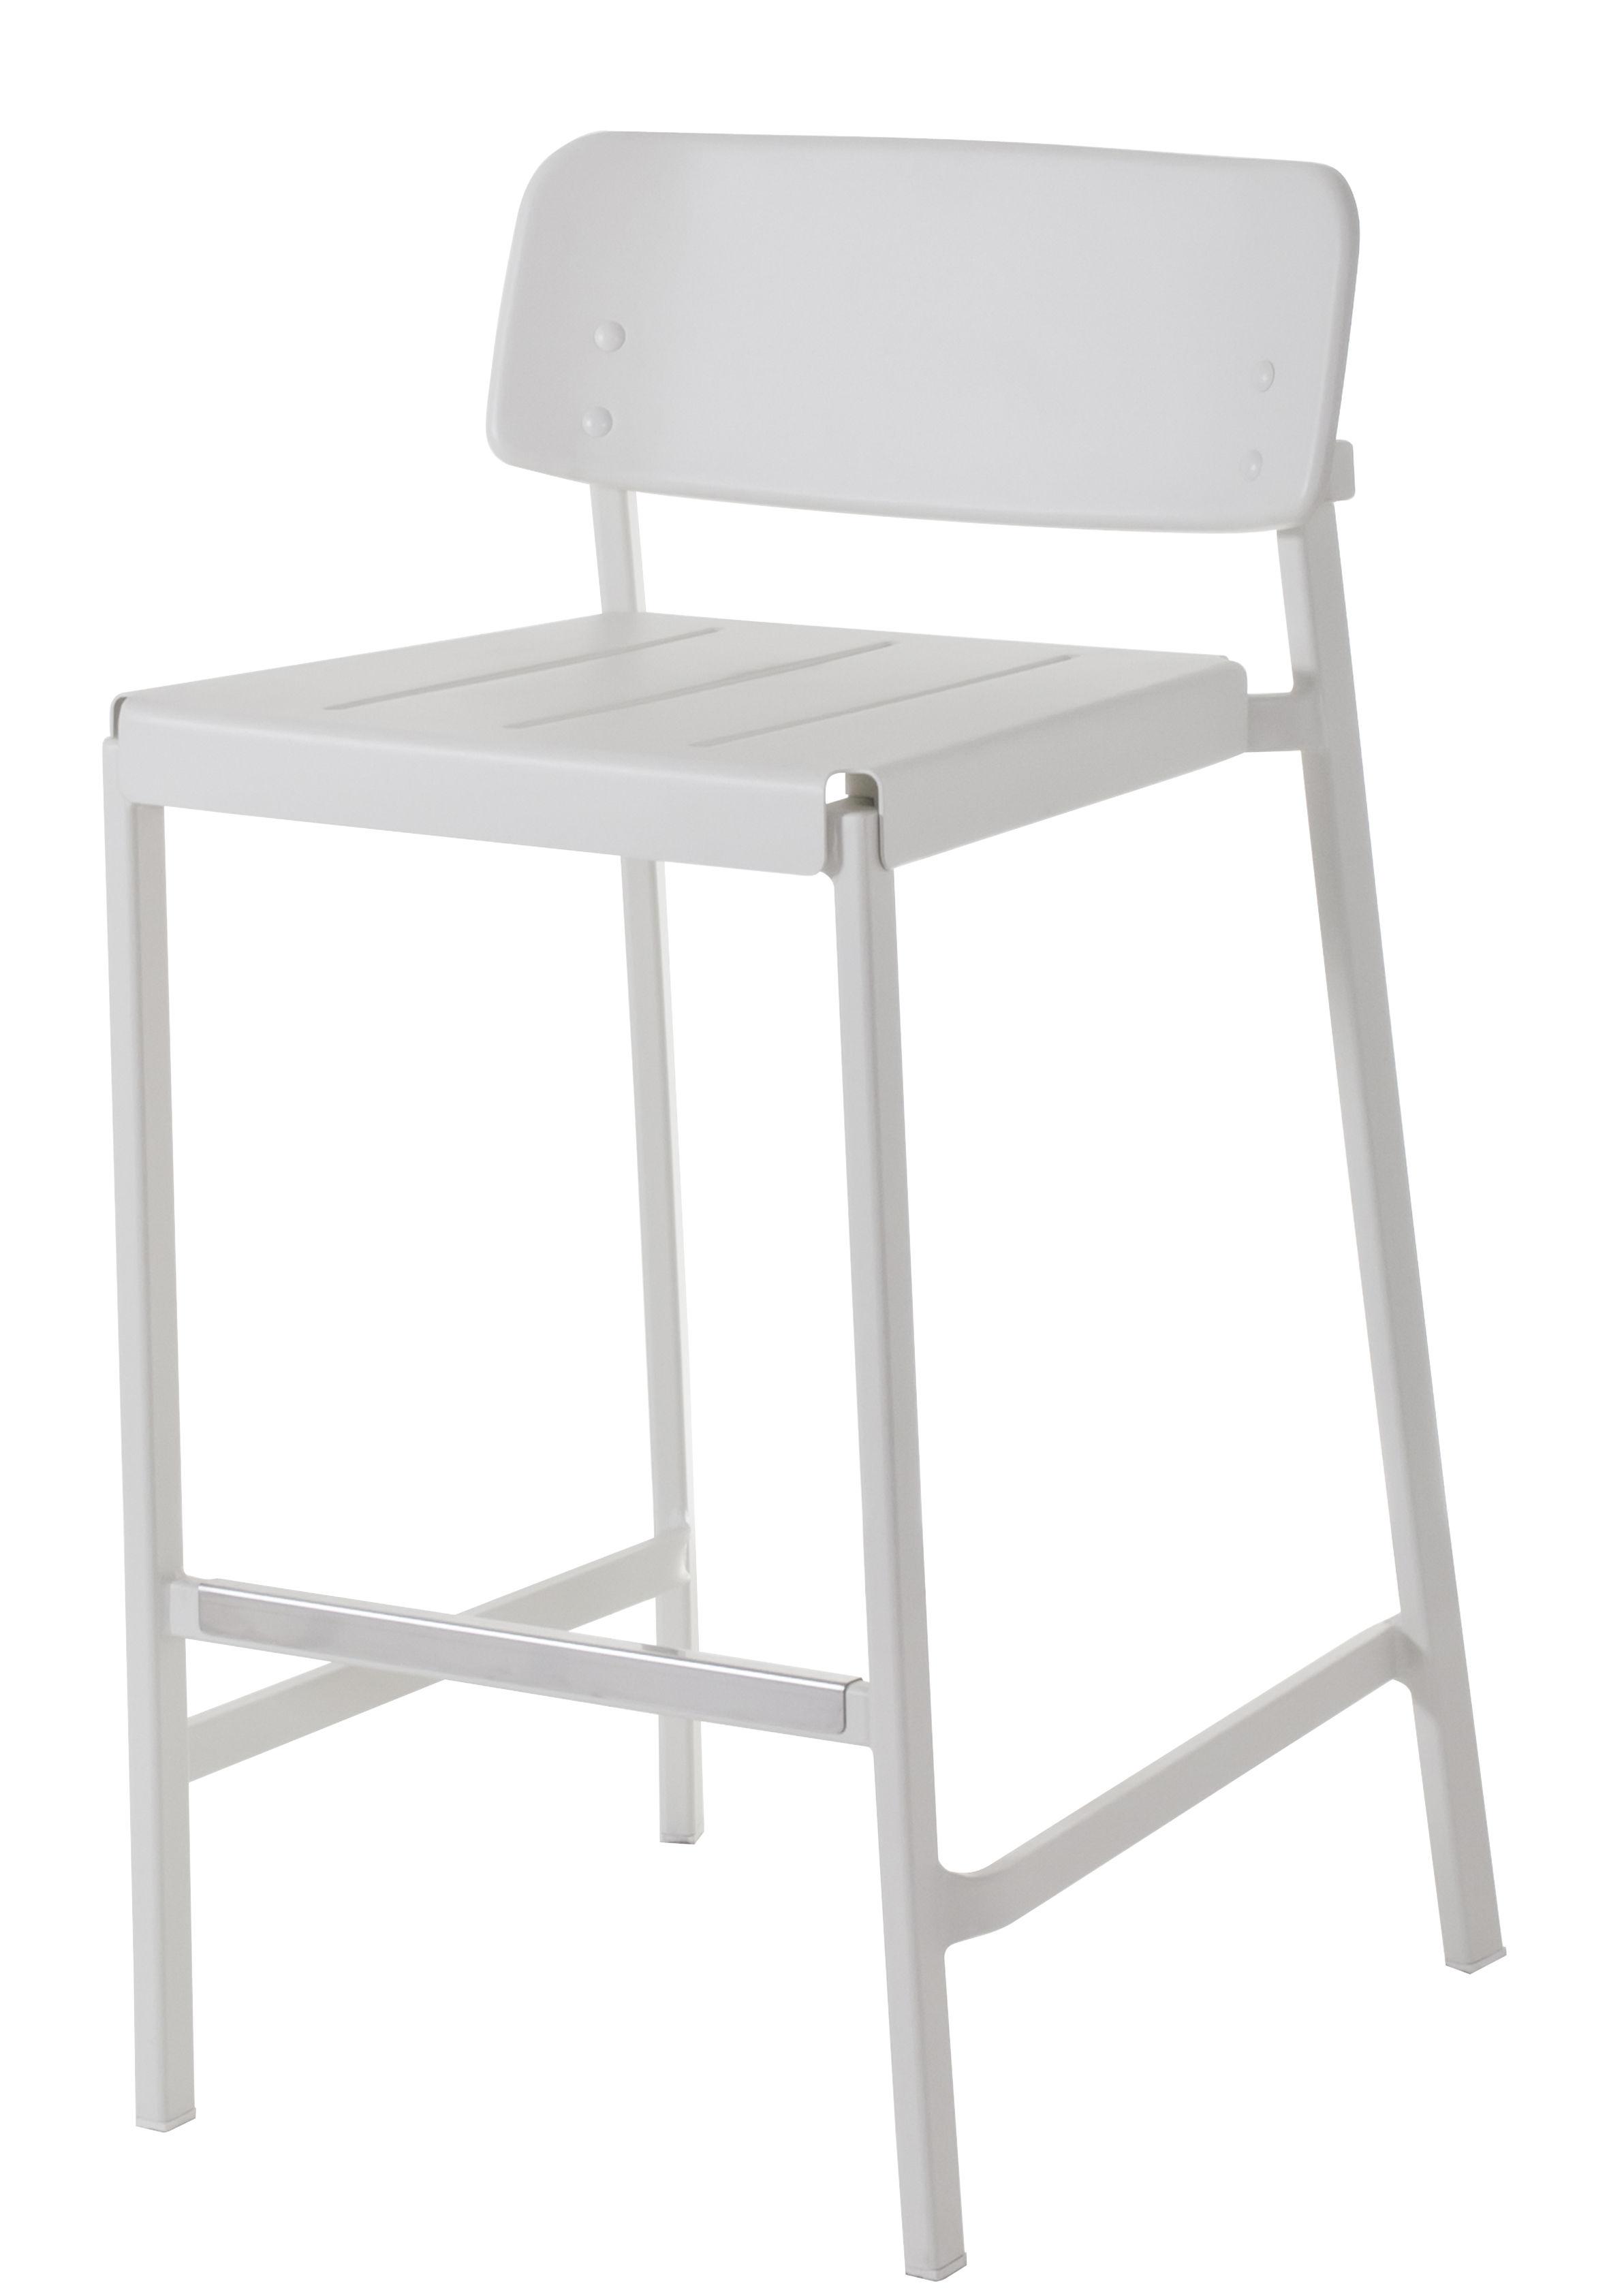 Furniture - Bar Stools - Shine Bar chair - H 75 cm - Metal by Emu - White - Varnished aluminium